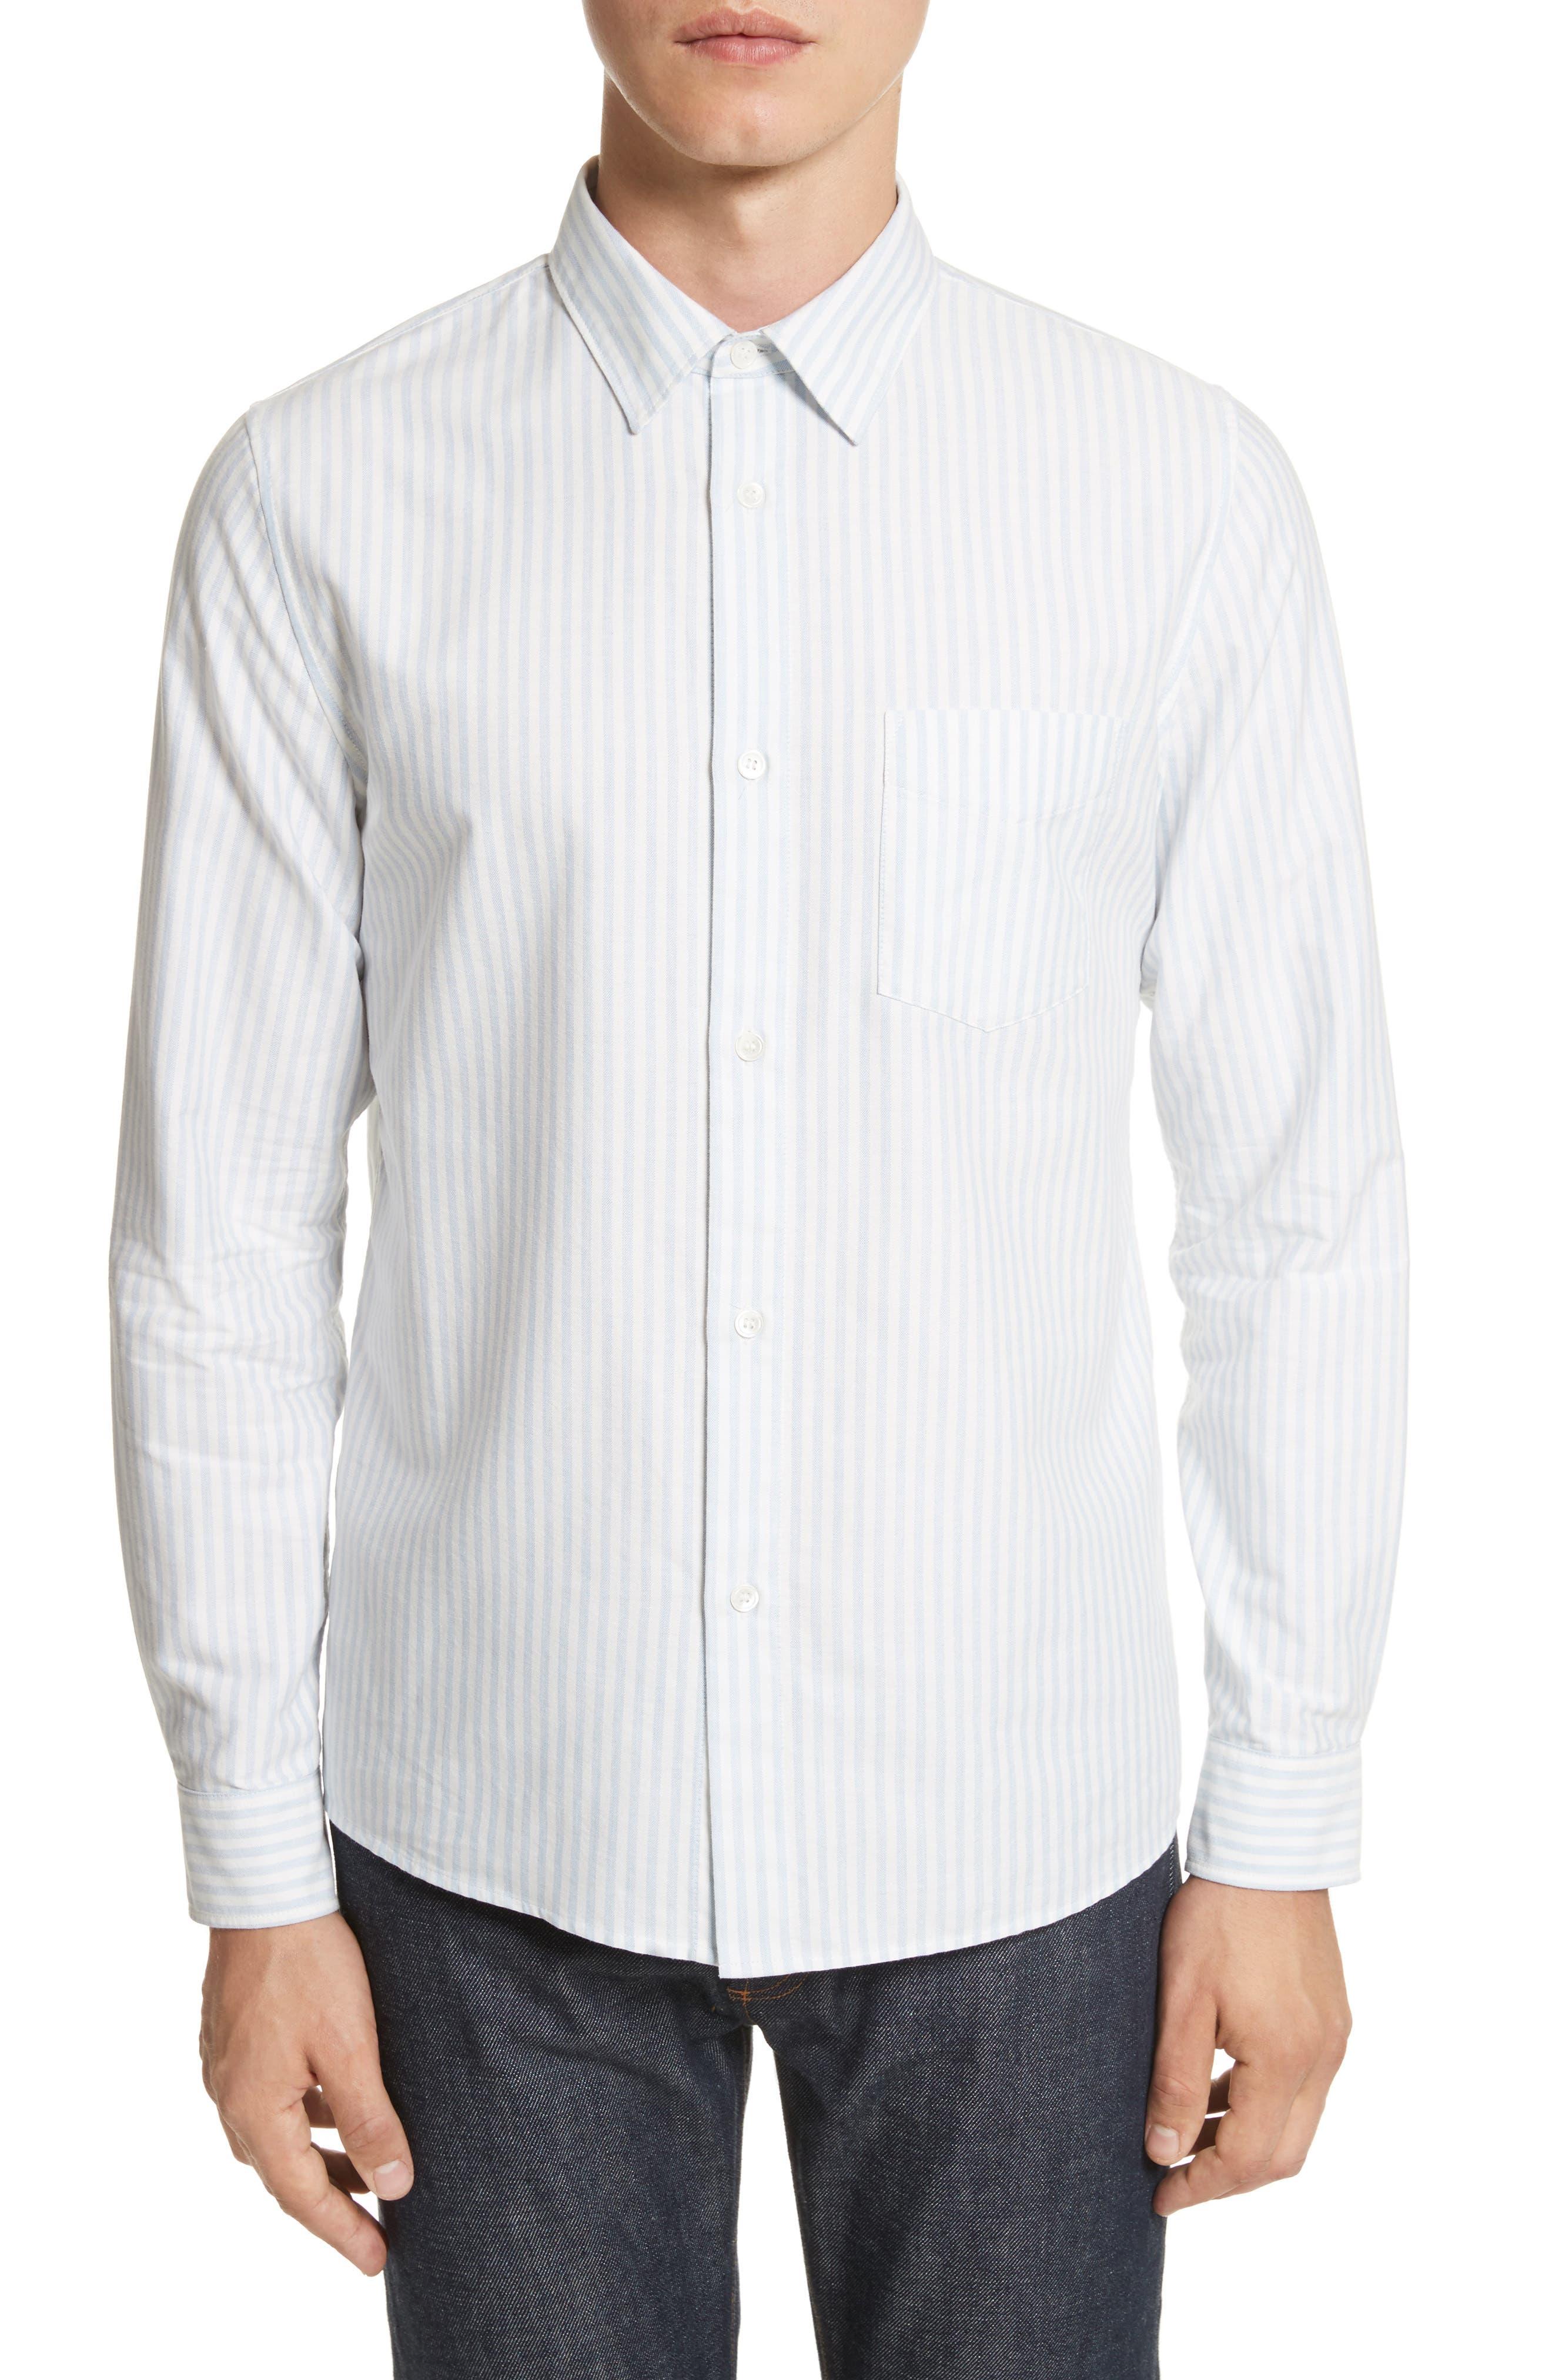 Oliver Stripe Oxford Shirt,                             Main thumbnail 1, color,                             430